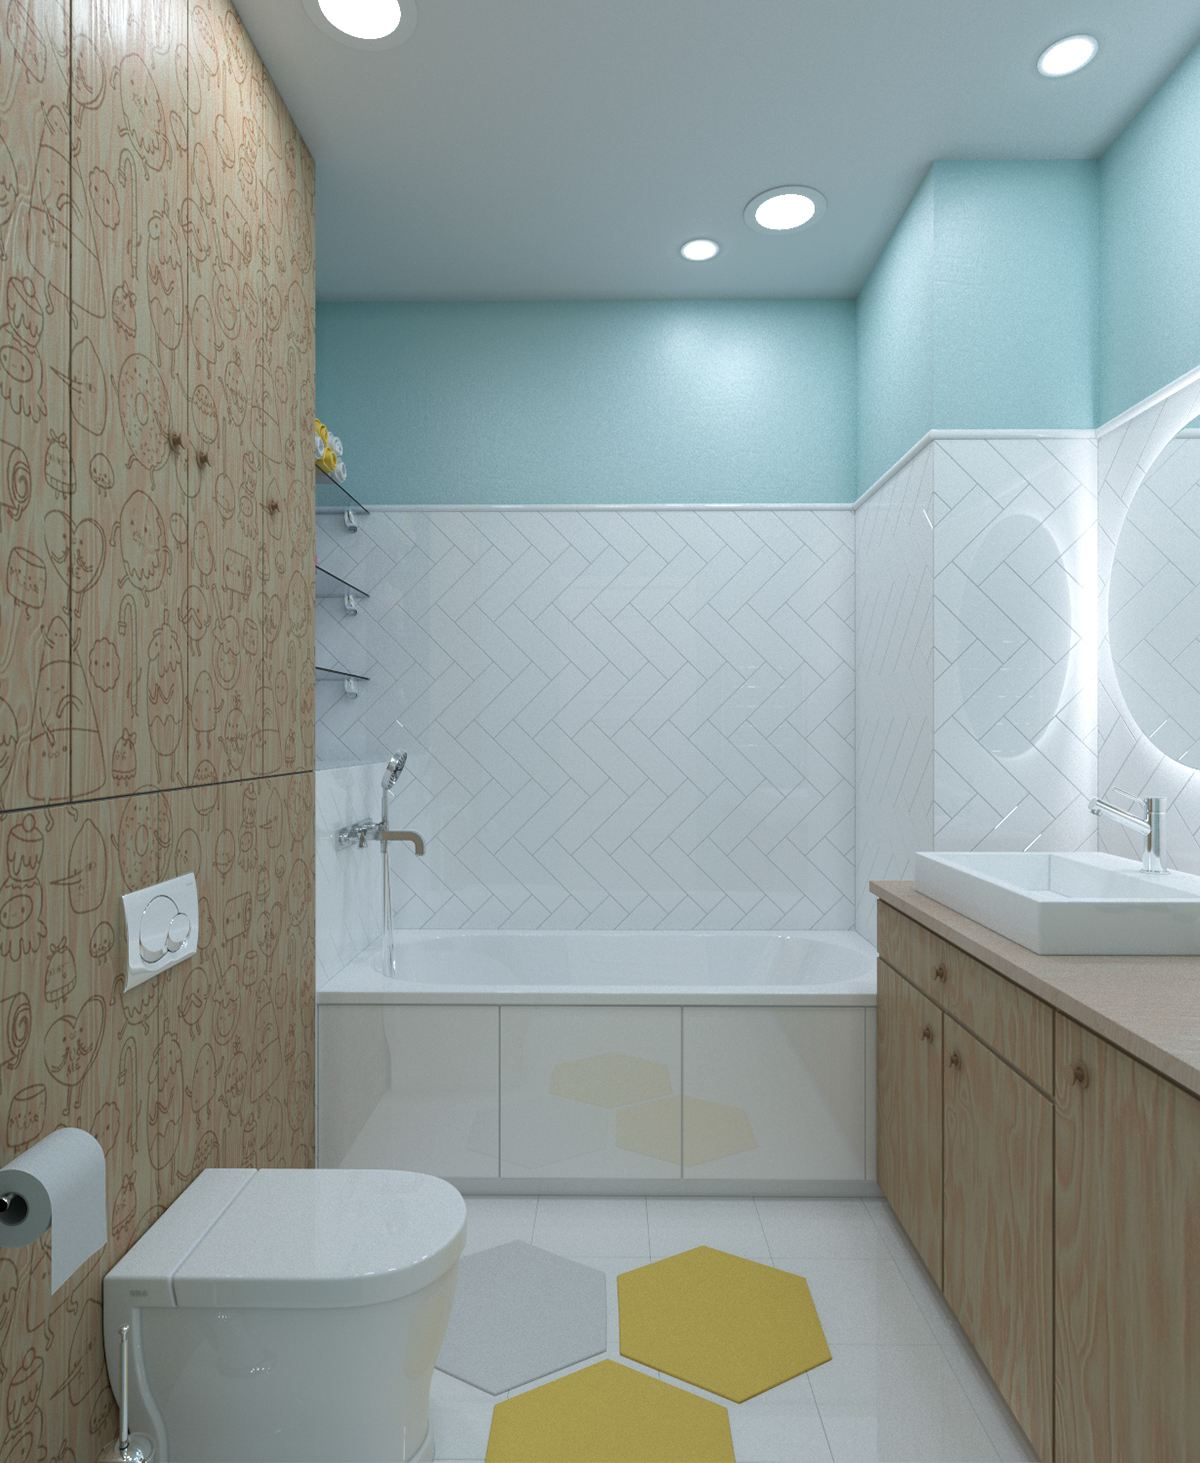 Colorful bathroom theme